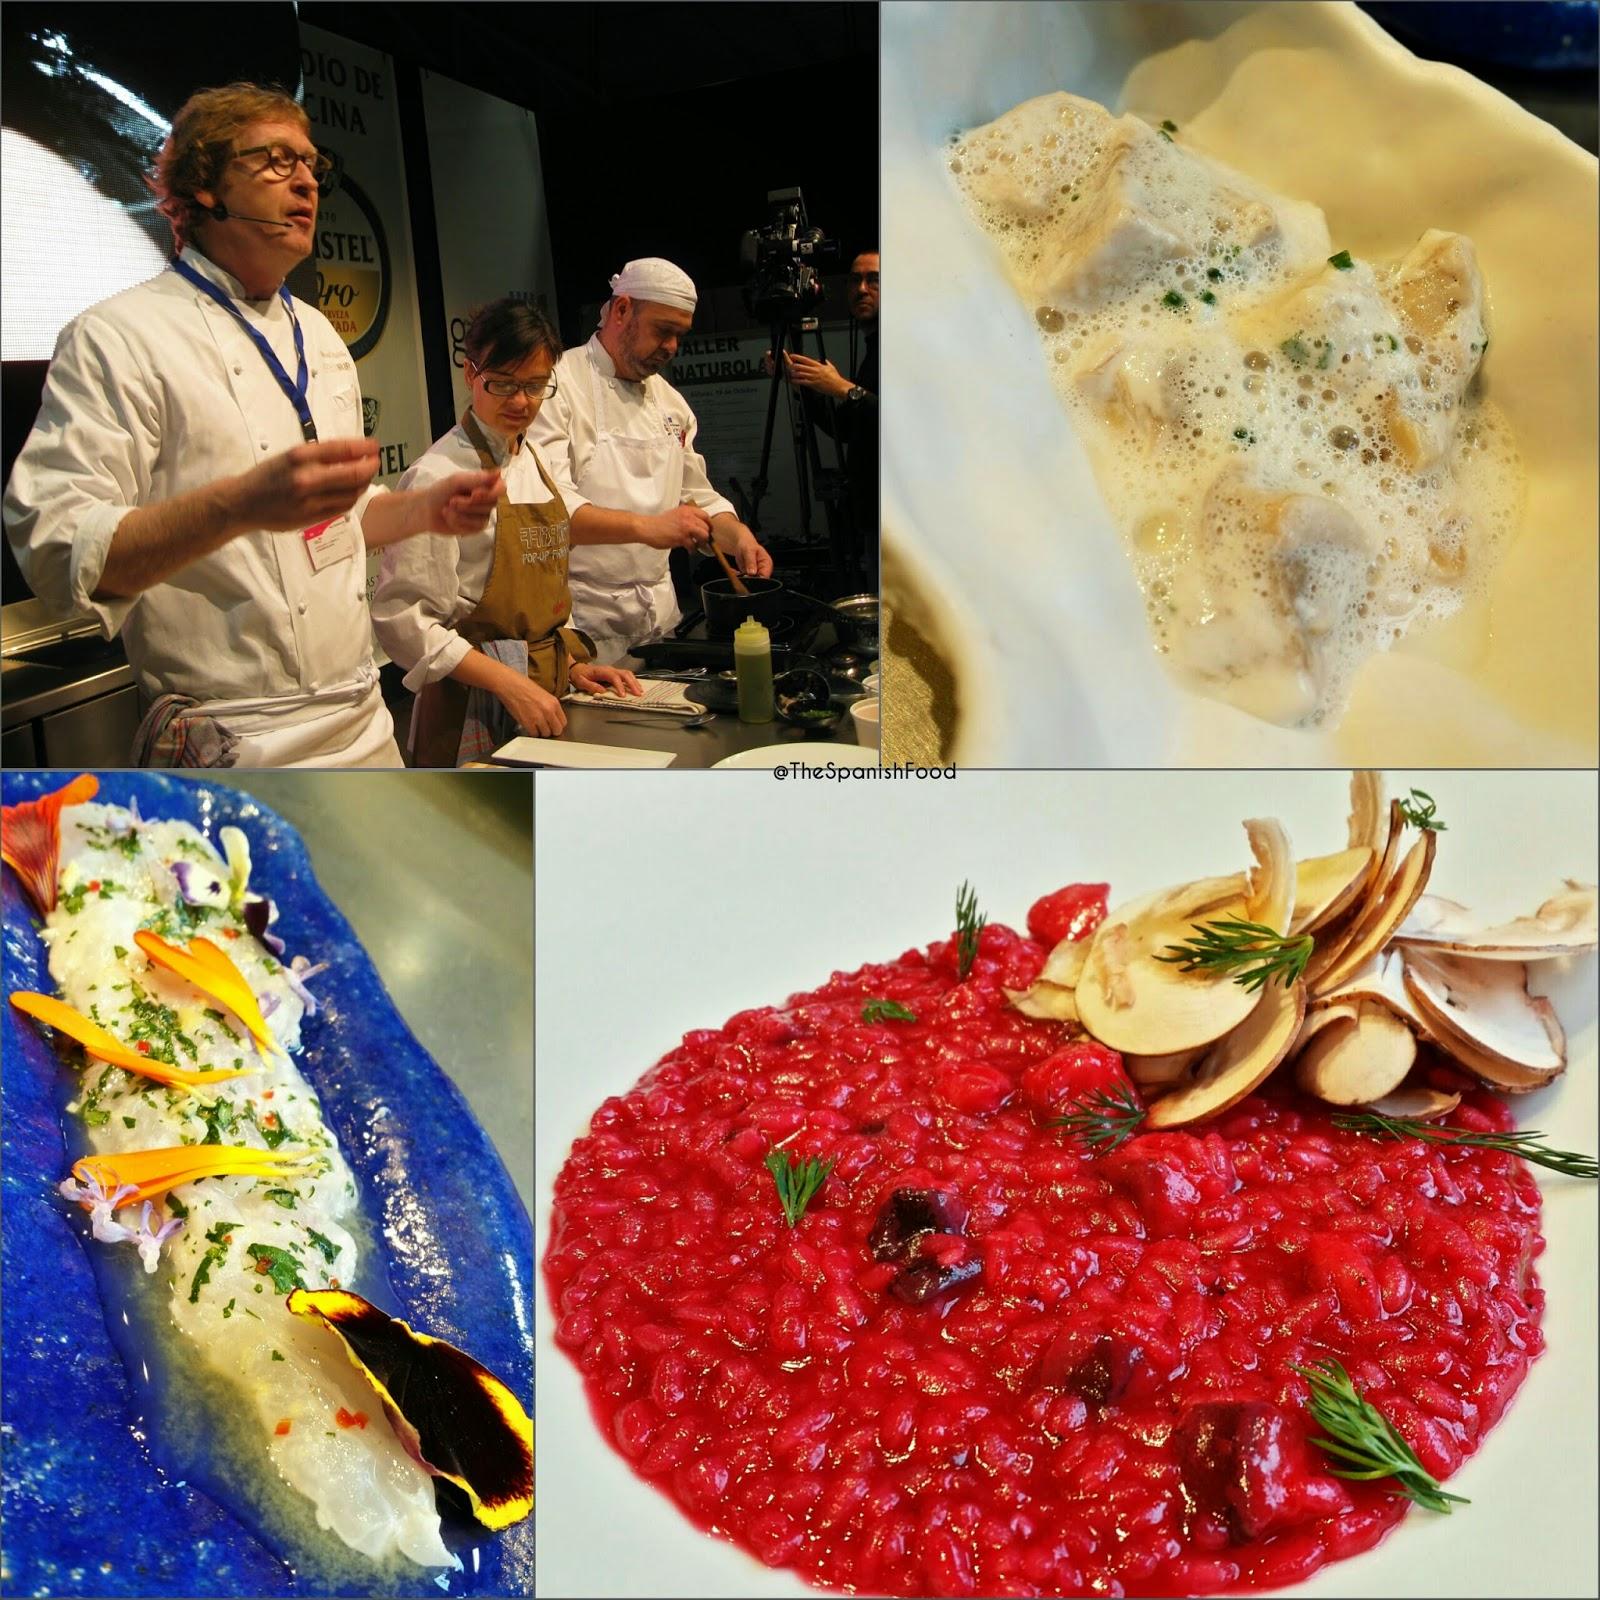 GastroAlicante 2015 - Bernd Knoller